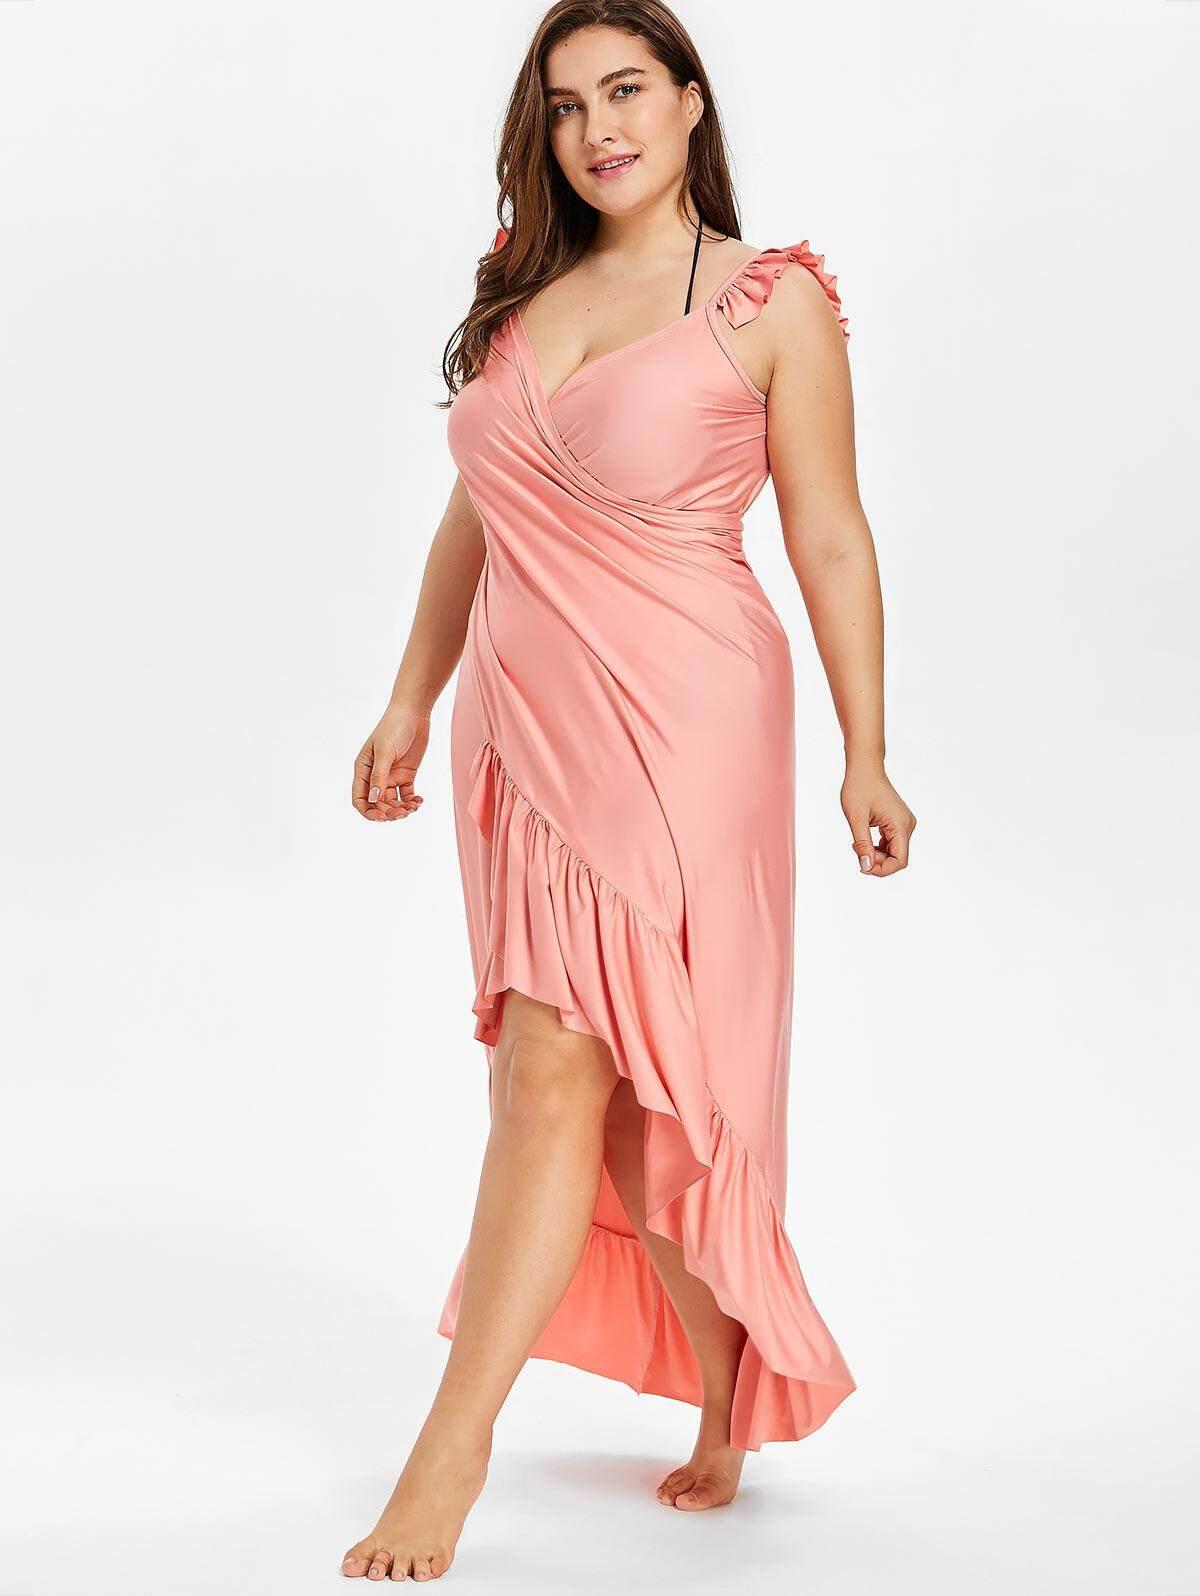 36148136d7f Maxi Plus Size Flounce Wrap Beach Dress Multifunctional Cover up Dress